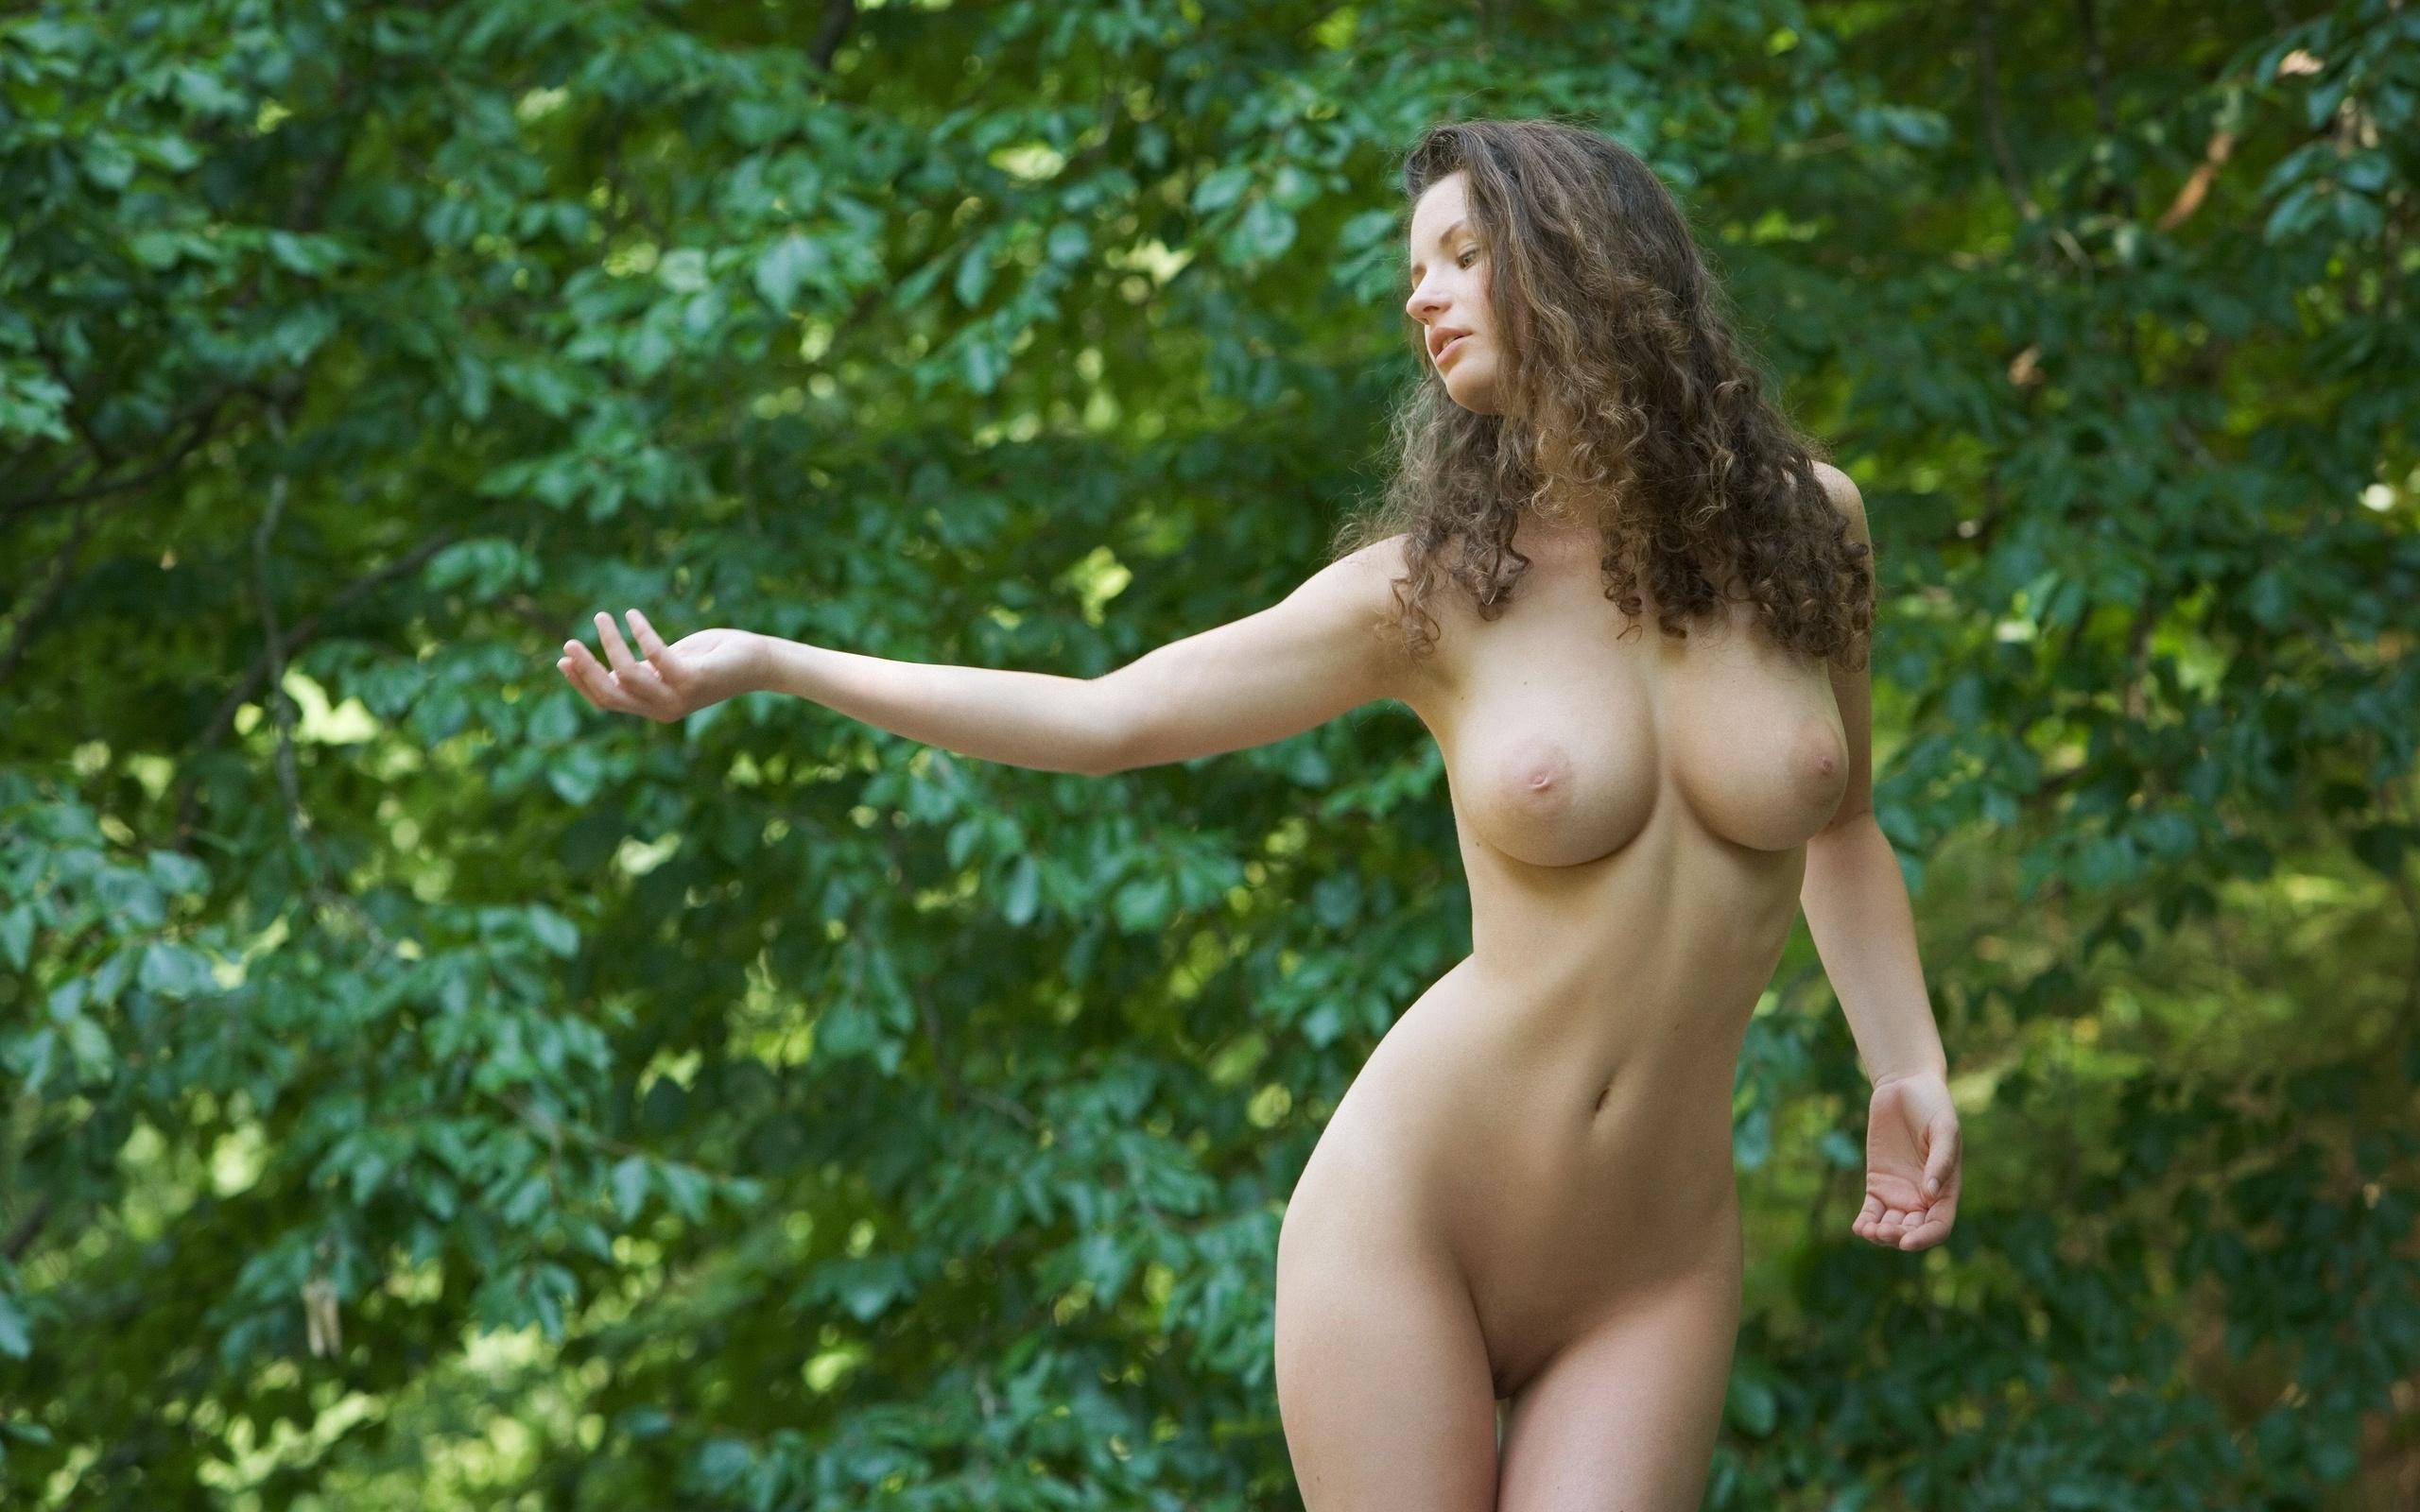 Шатенка голая на природе 3 фотография